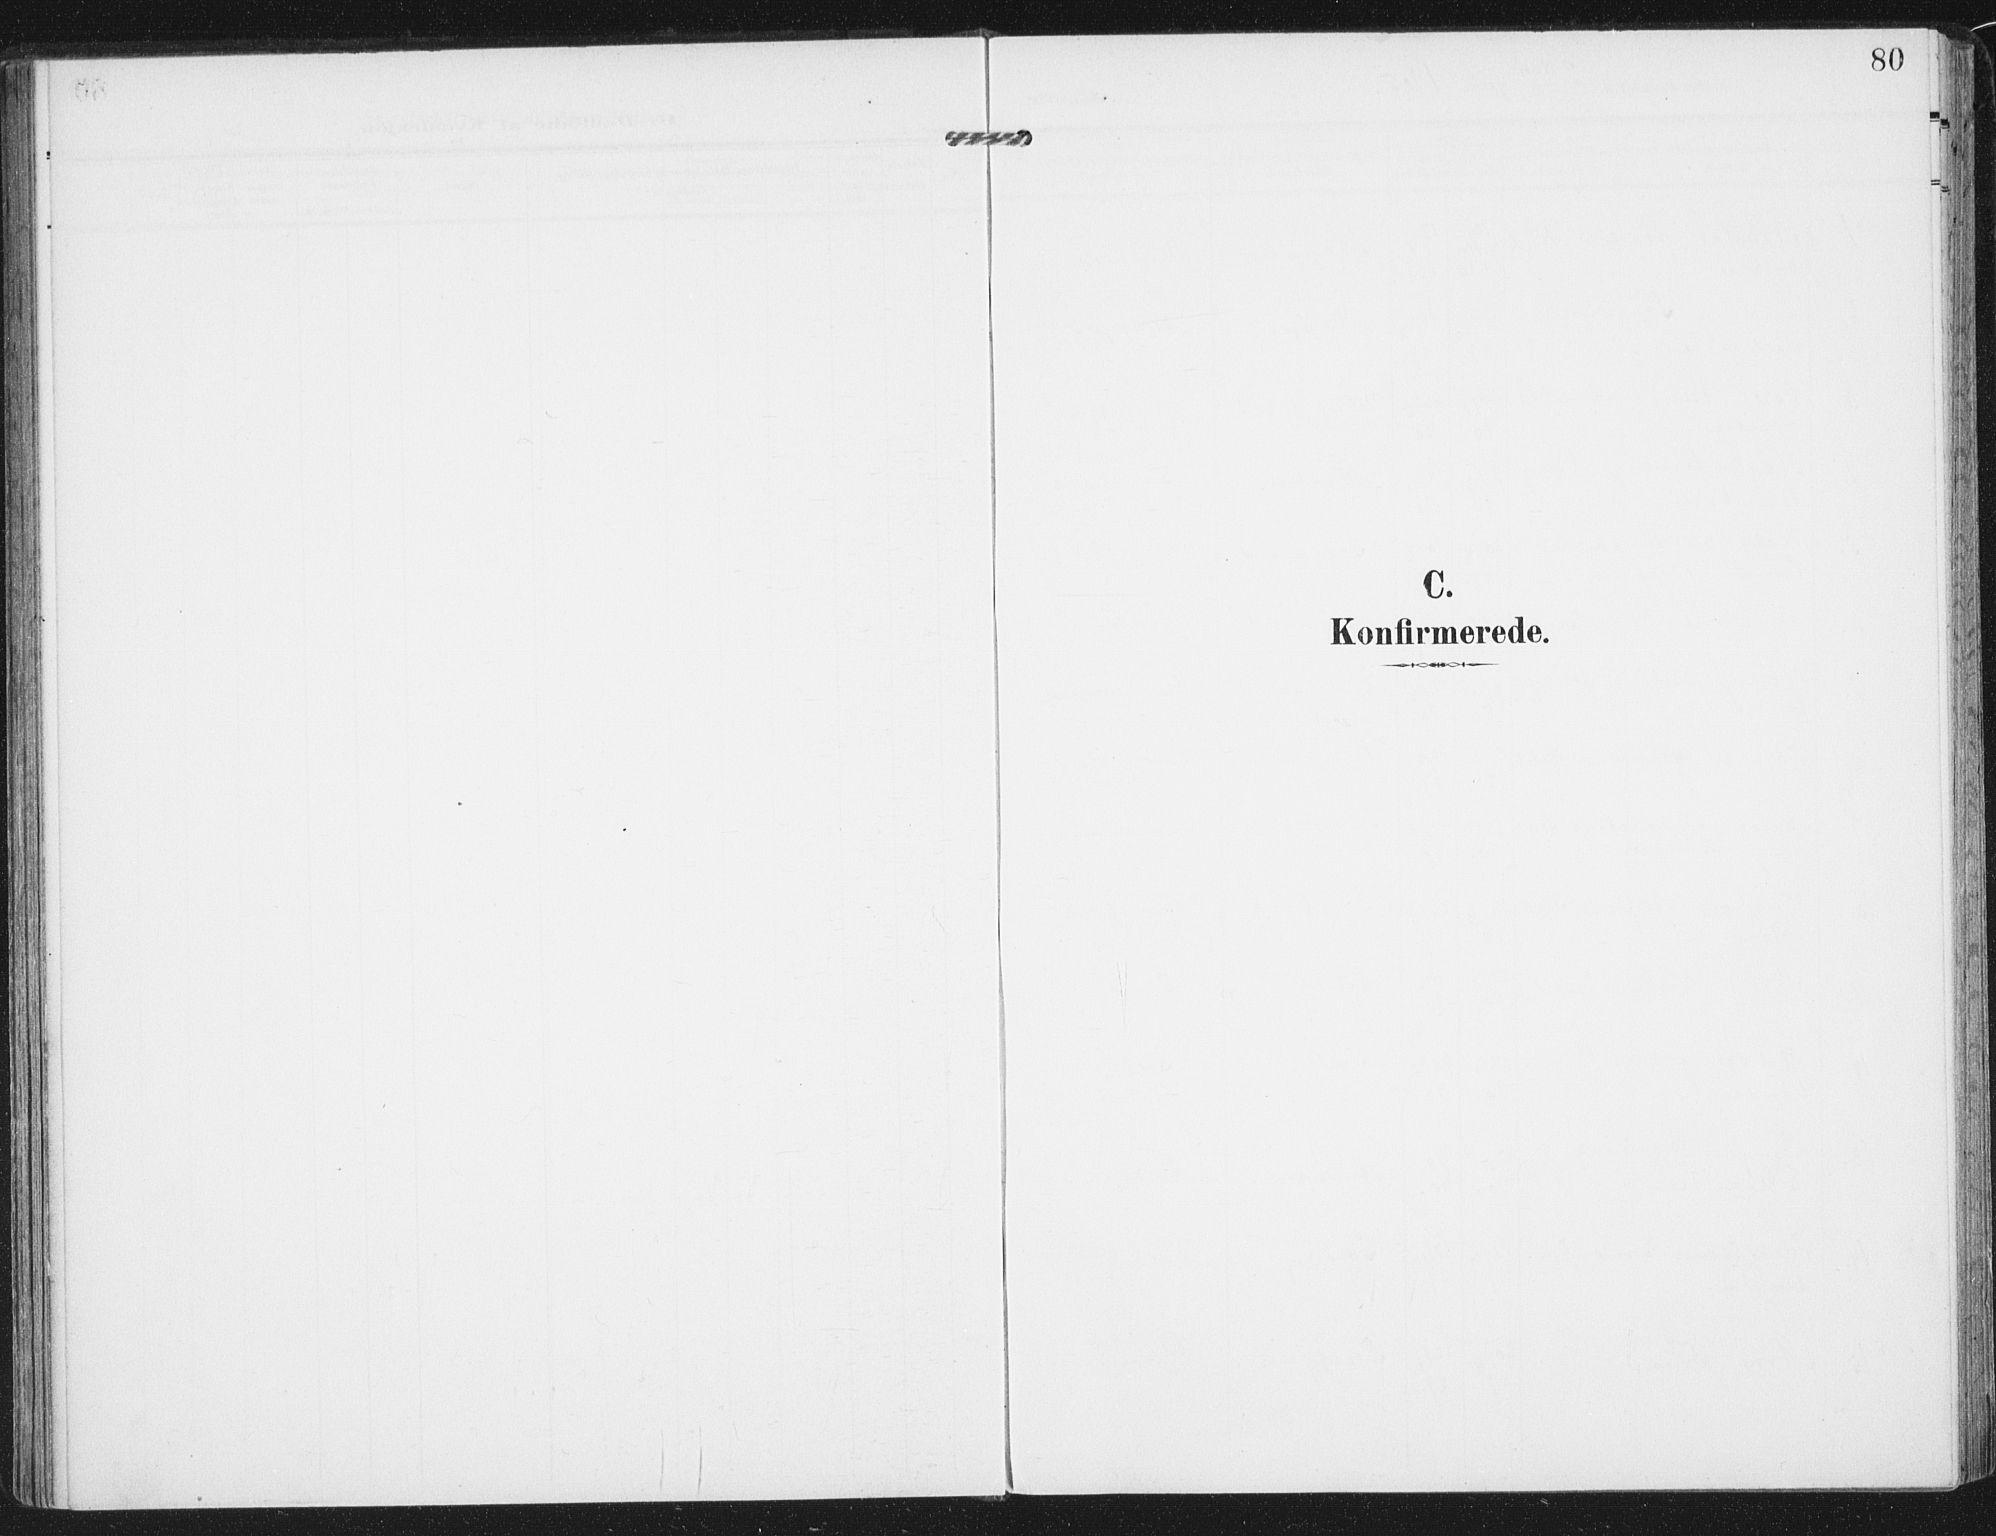 SAT, Ministerialprotokoller, klokkerbøker og fødselsregistre - Nordland, 885/L1206: Ministerialbok nr. 885A07, 1905-1915, s. 80